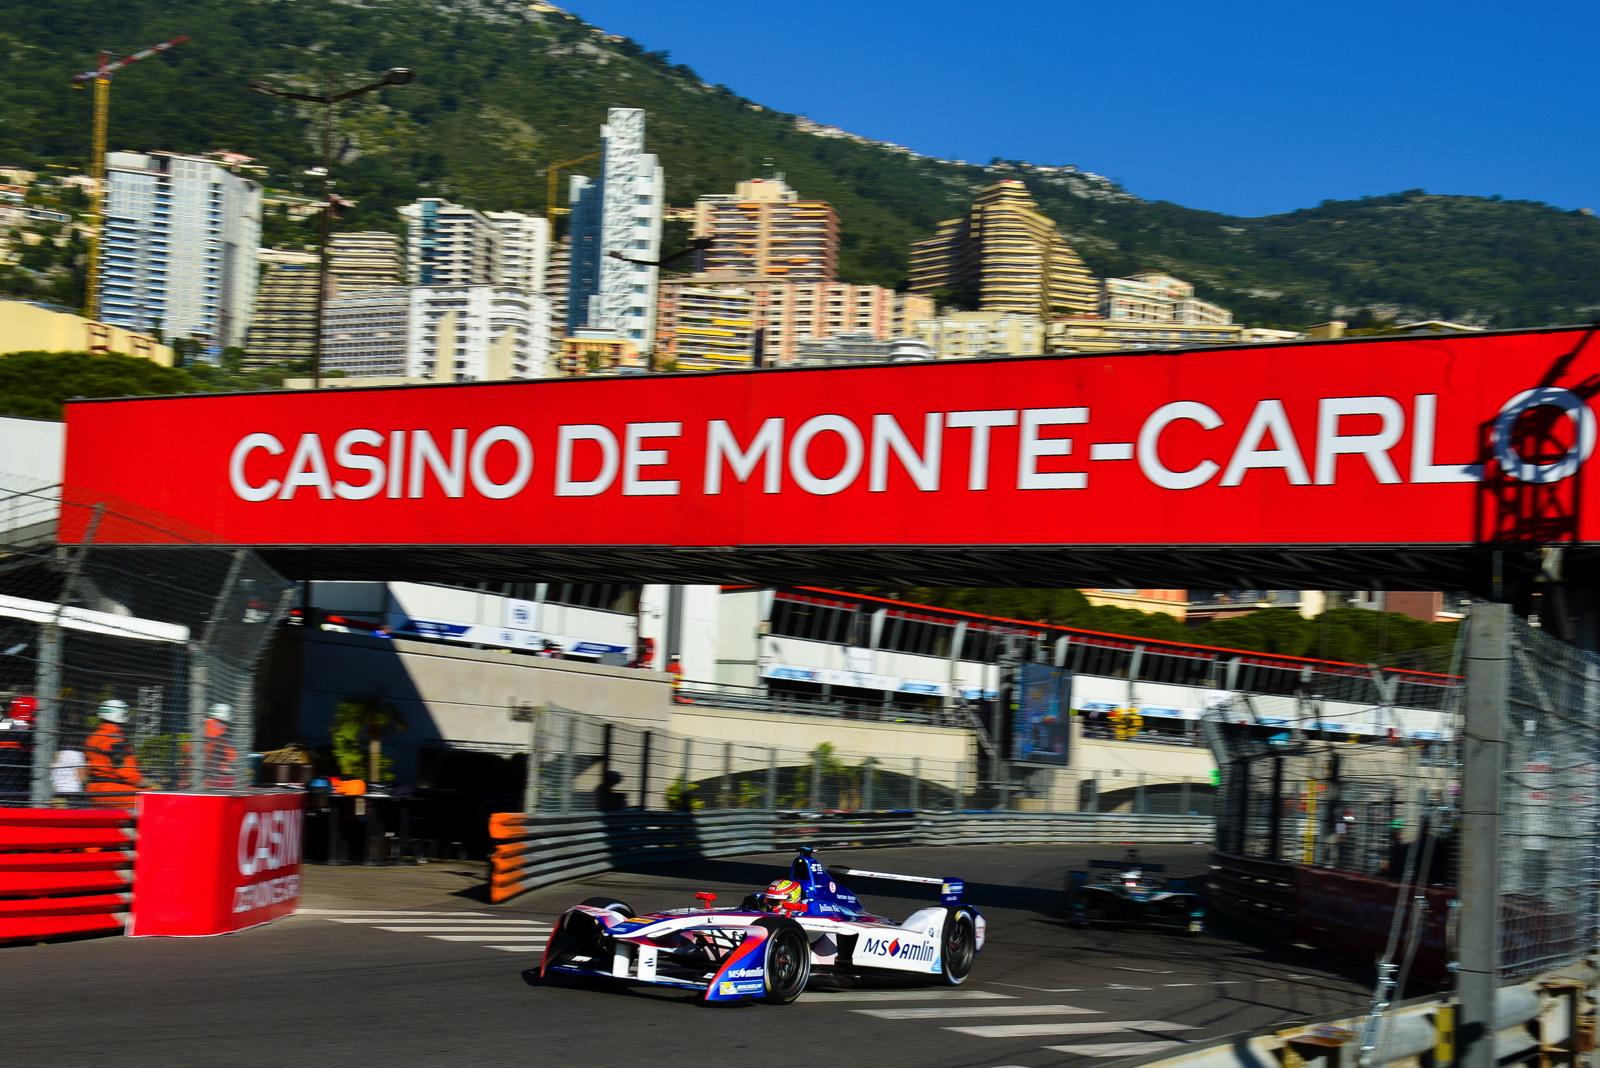 MS Amlin Andretti in the Monaco ePrix 01